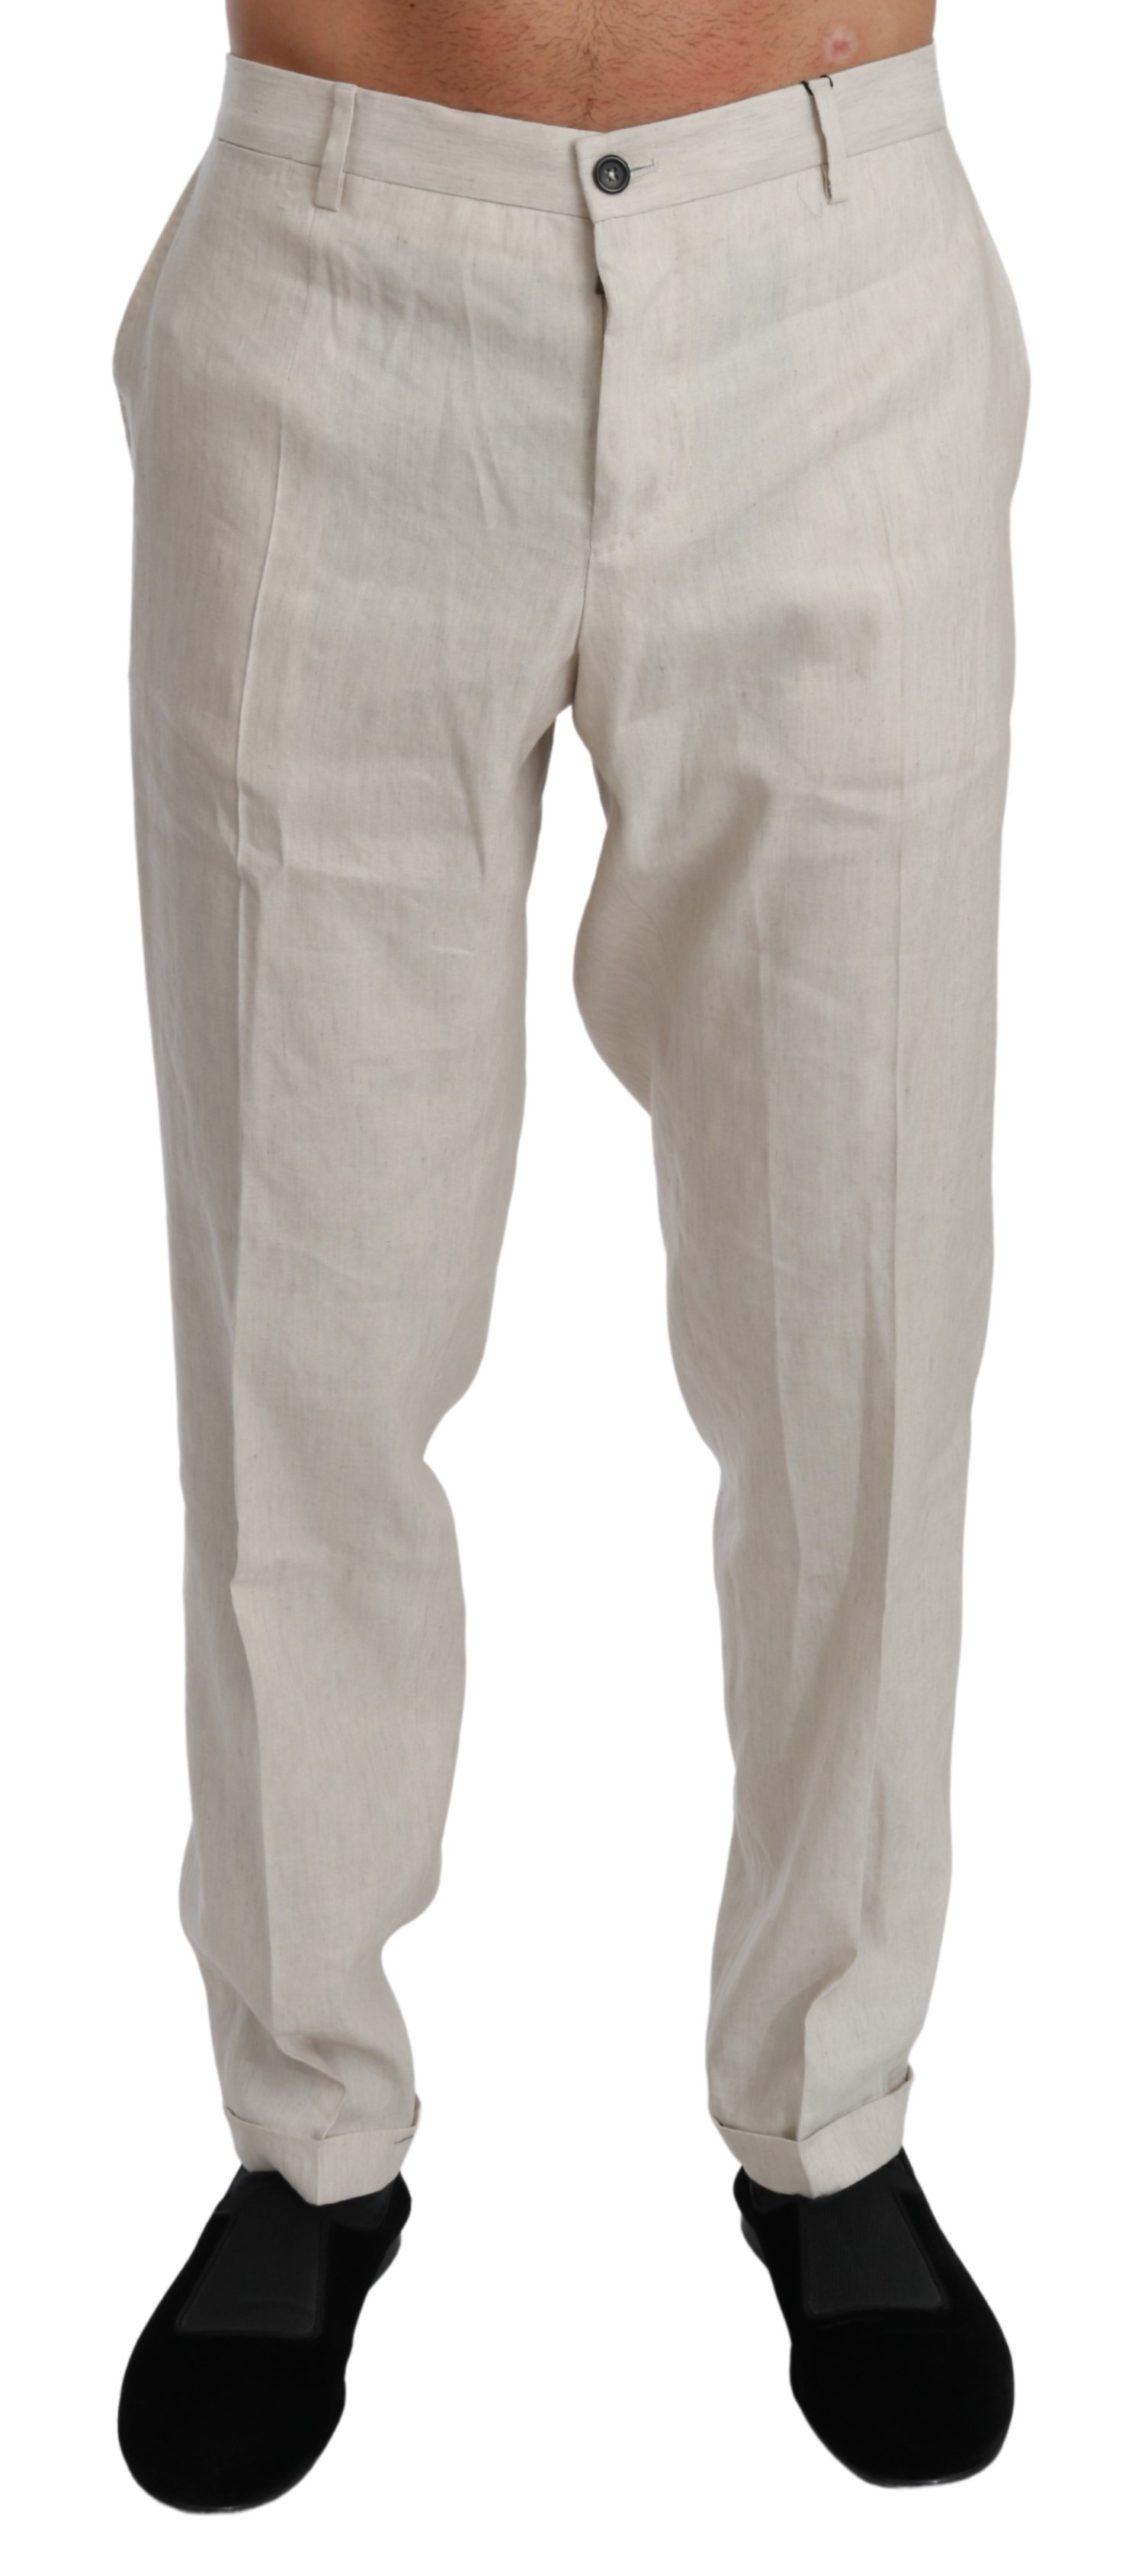 Dolce & Gabbana Men's Linen Casual Flax Trouser White PAN70993 - IT52 | XL